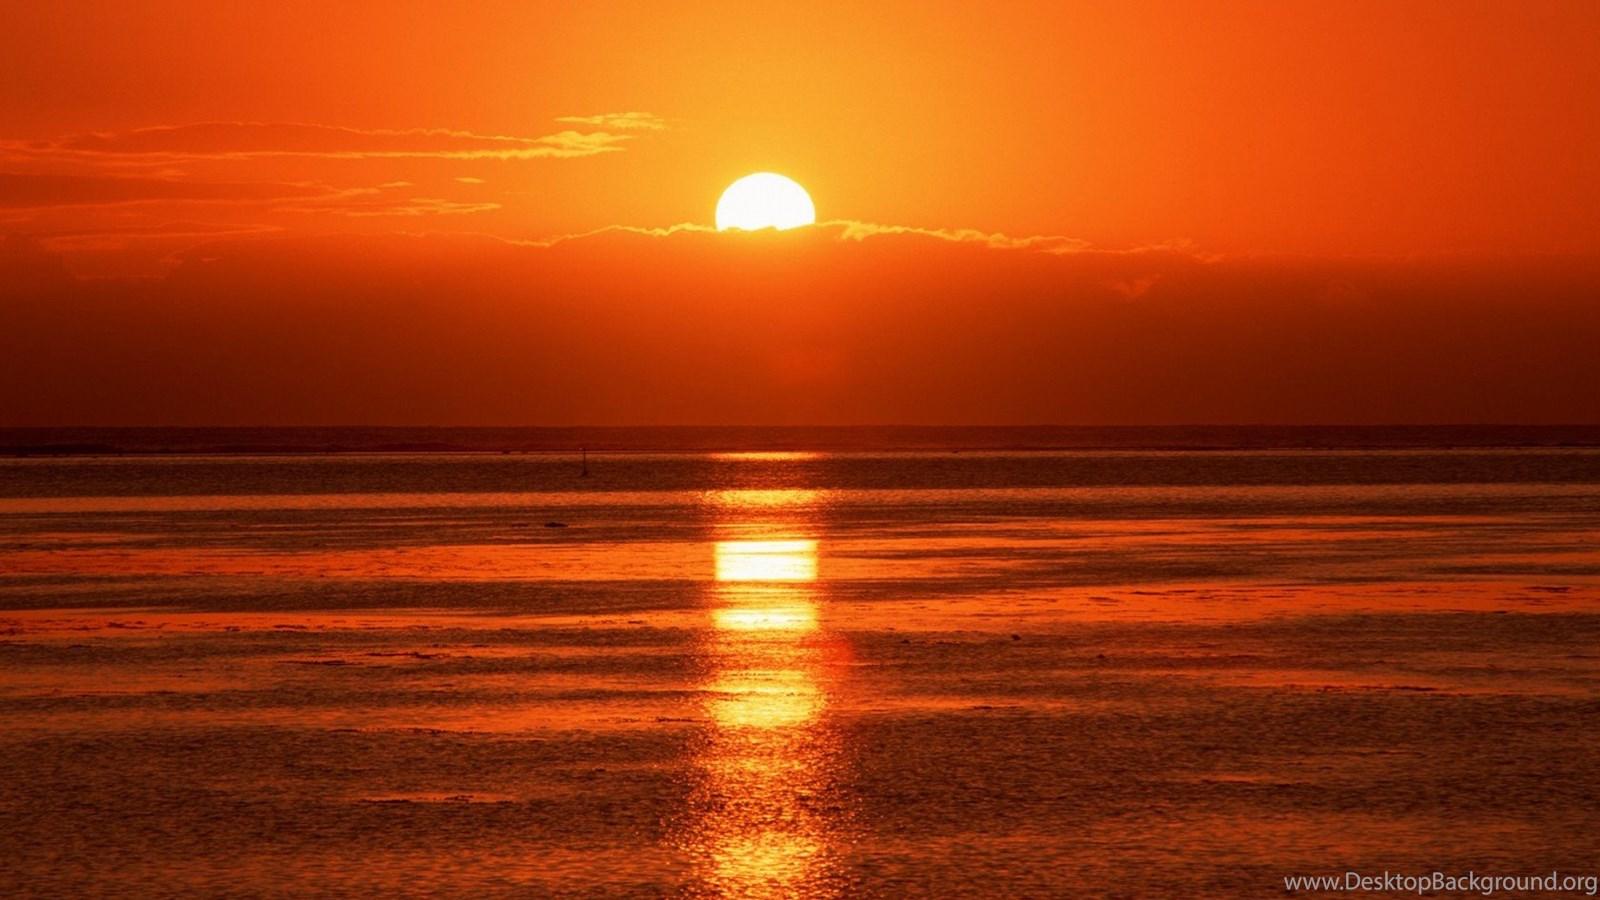 Download Romantic Beach Sunset Wallpapers Desktop Backgrounds